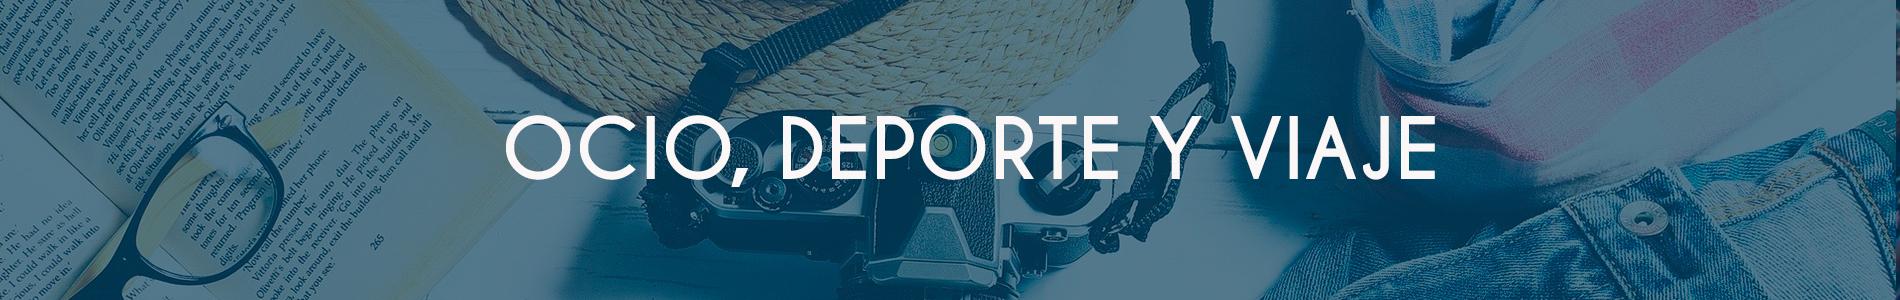 banner-ocio-deporte-viaje-1900x300